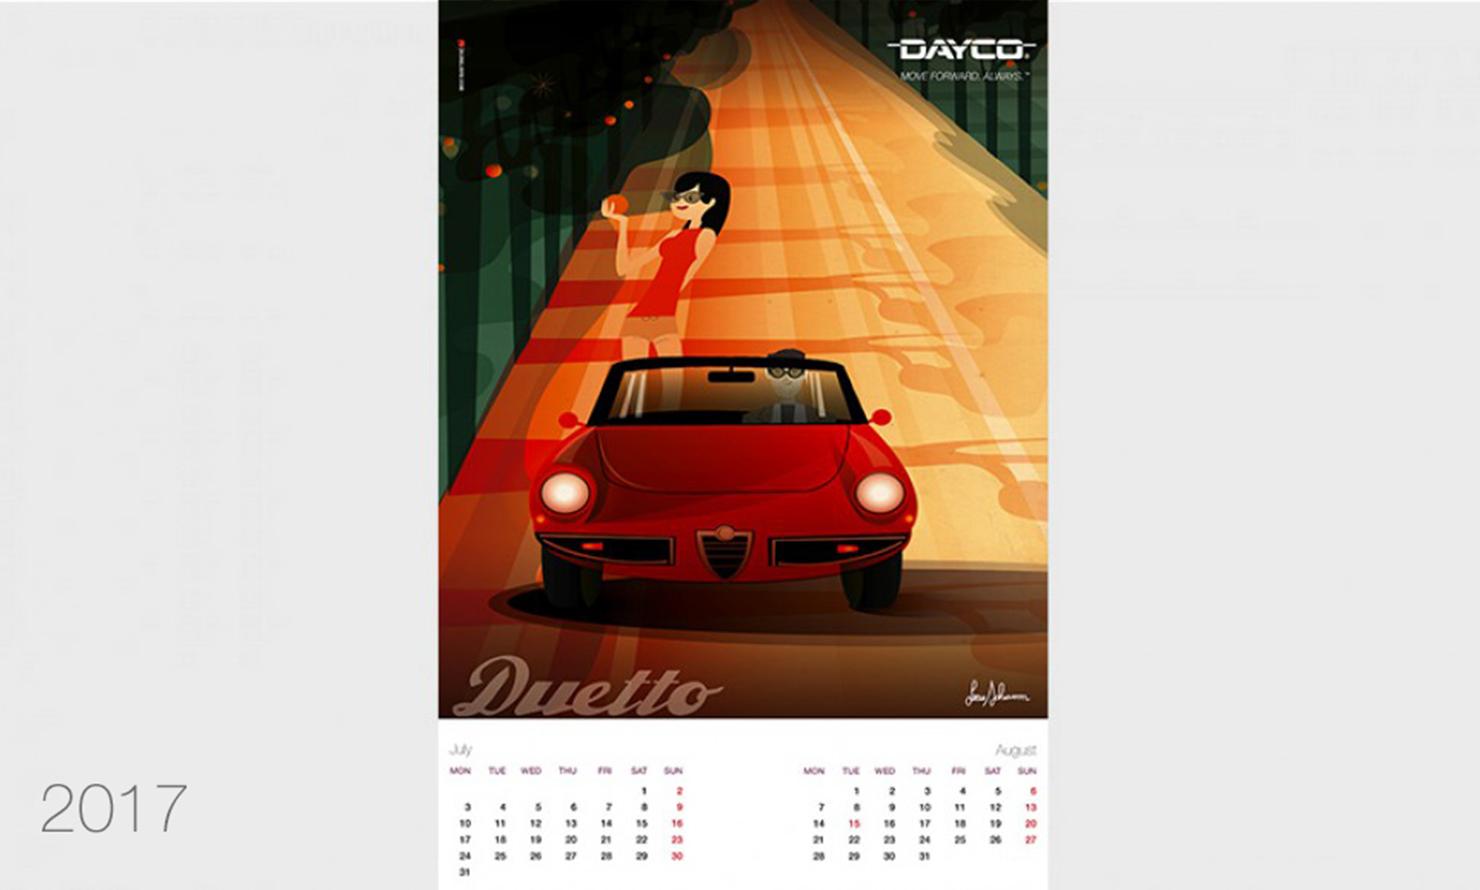 https://www.kubelibre.com/uploads/Slider-work-tutti-clienti/dayco-calendario-2017-4.jpg